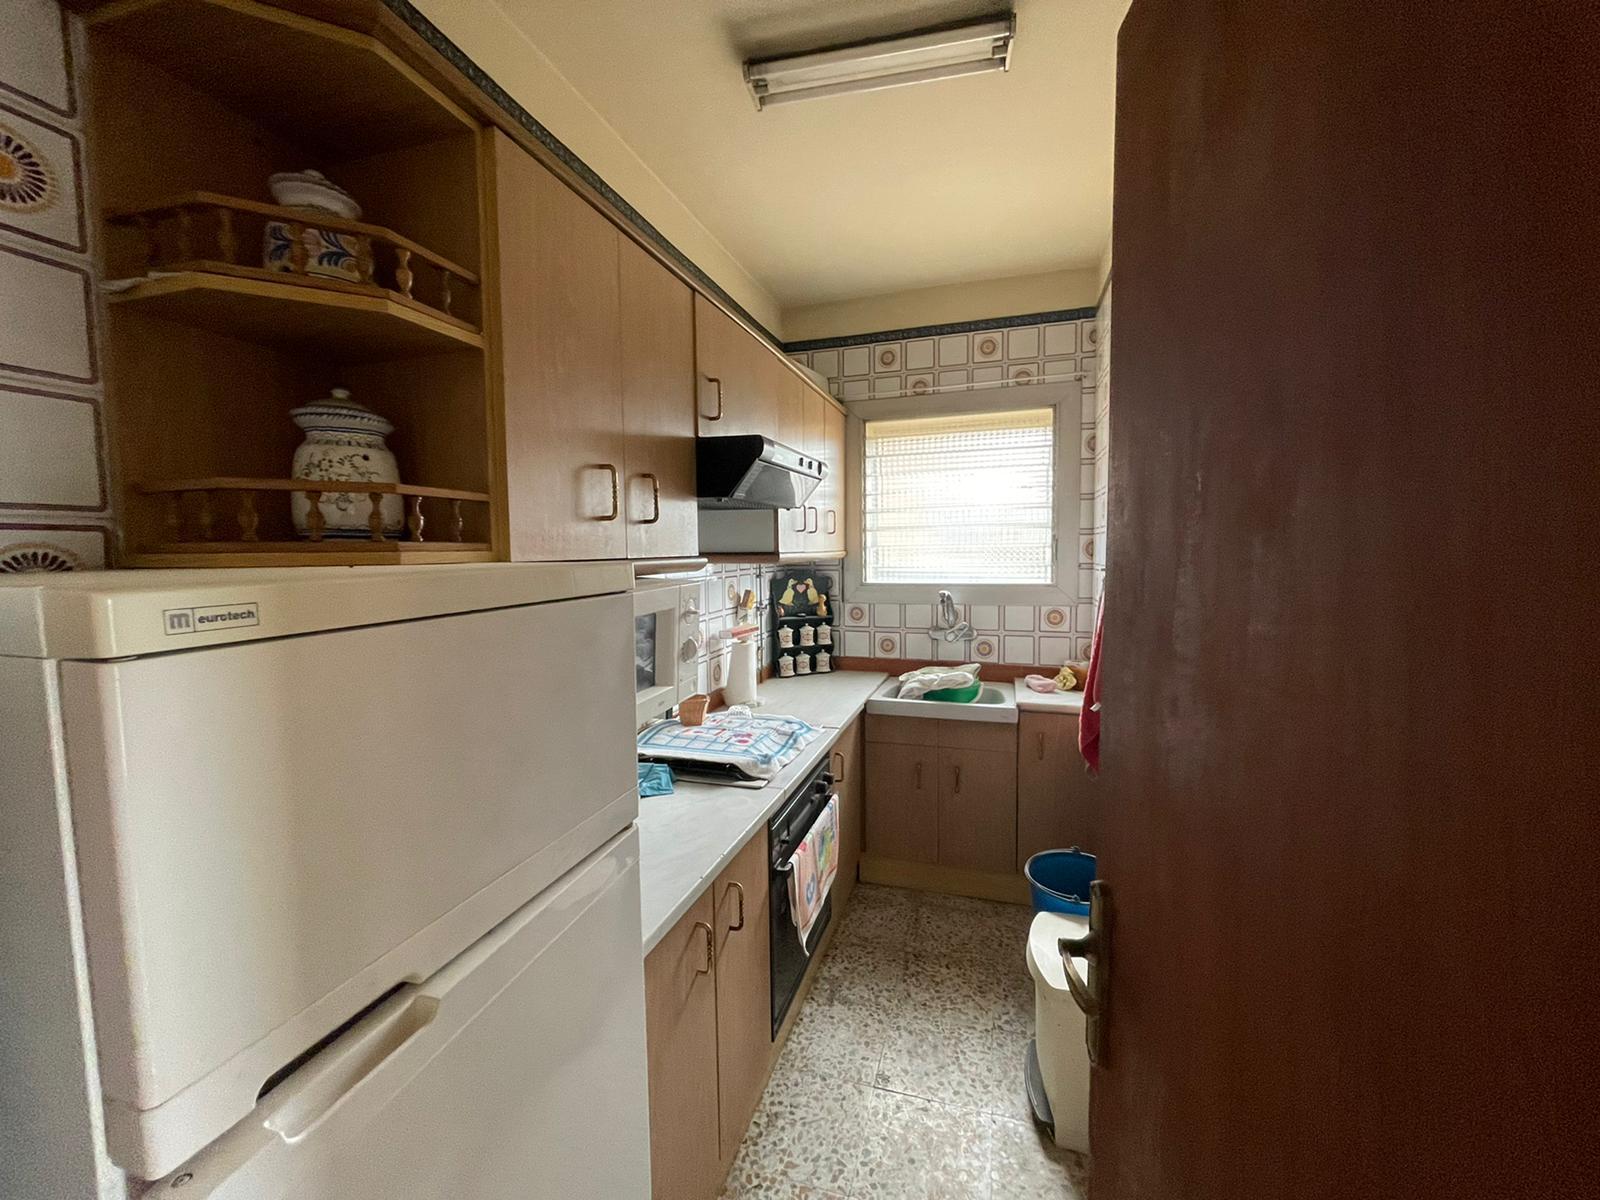 Piso en Urbanització sant roc en Santa Coloma de Cervelló en Venta por 340.000€